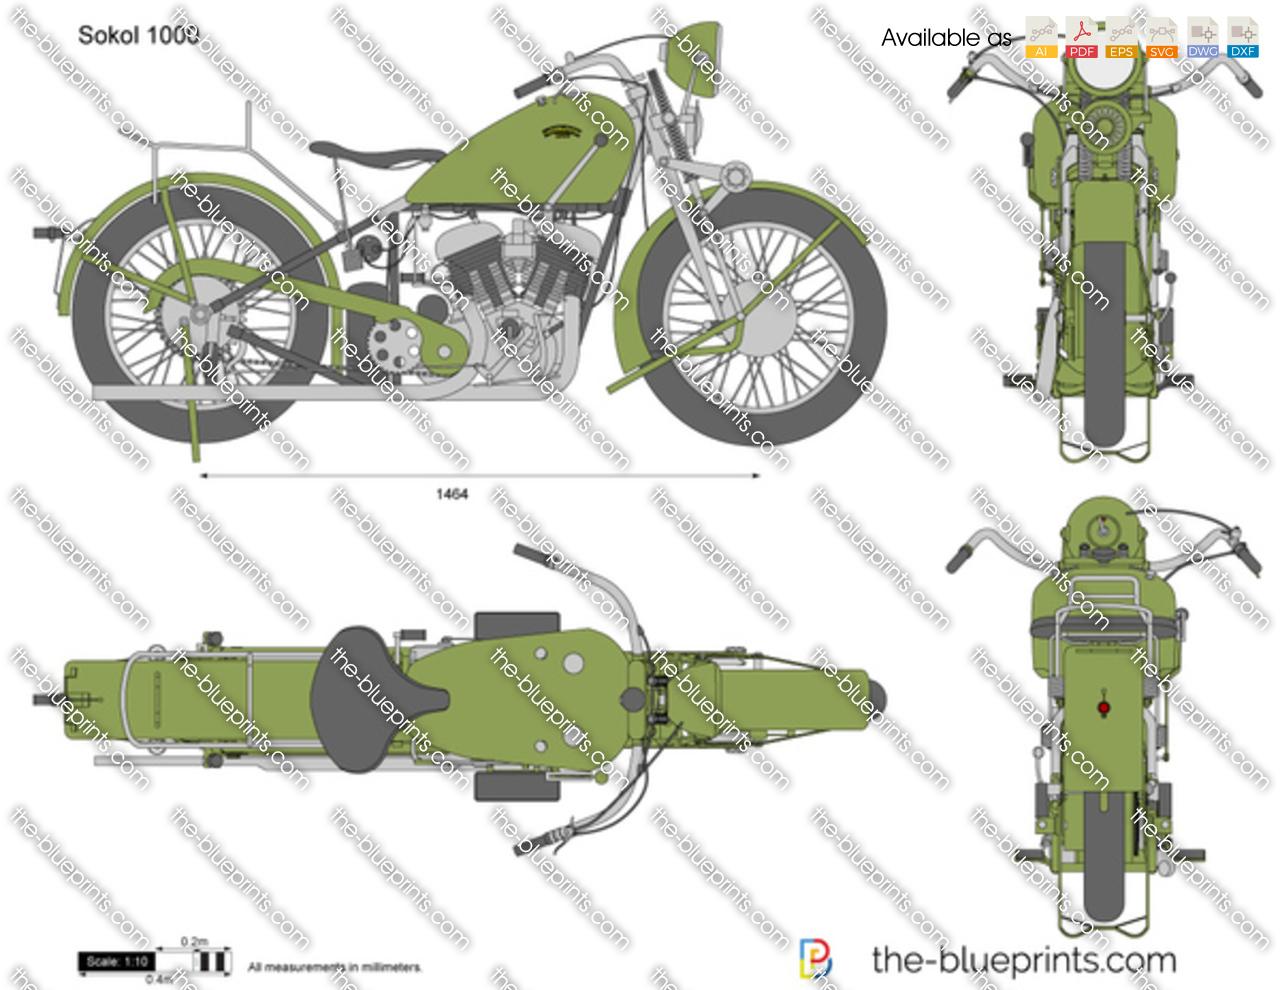 Sokol 1000 1936